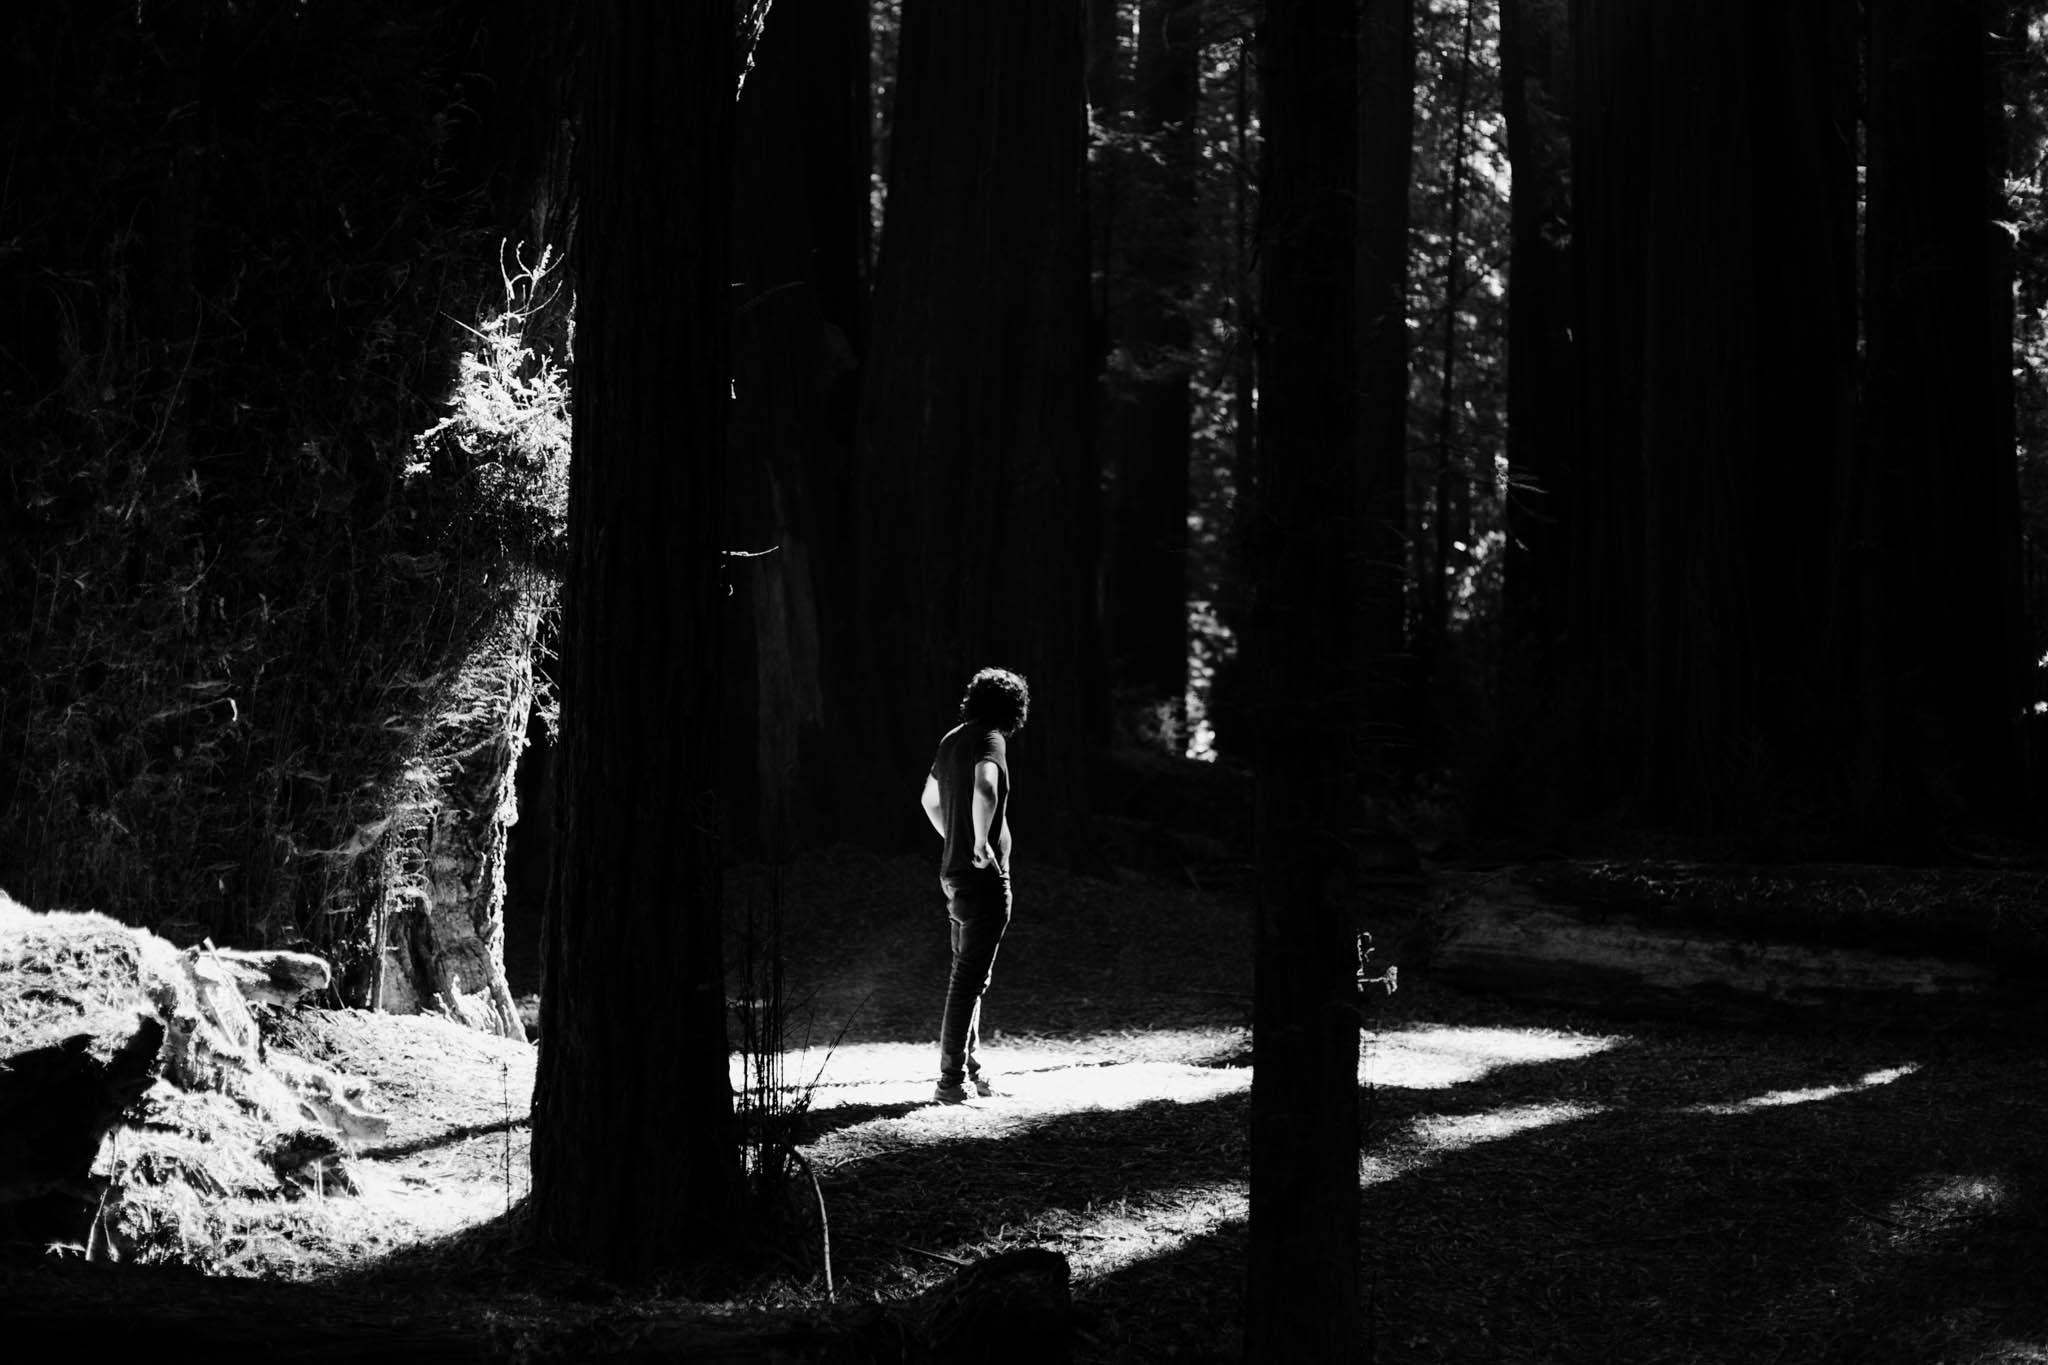 Vancouver Photographer - West Coast Road Trip-Emmy Lou Virginia Photography-26.jpg